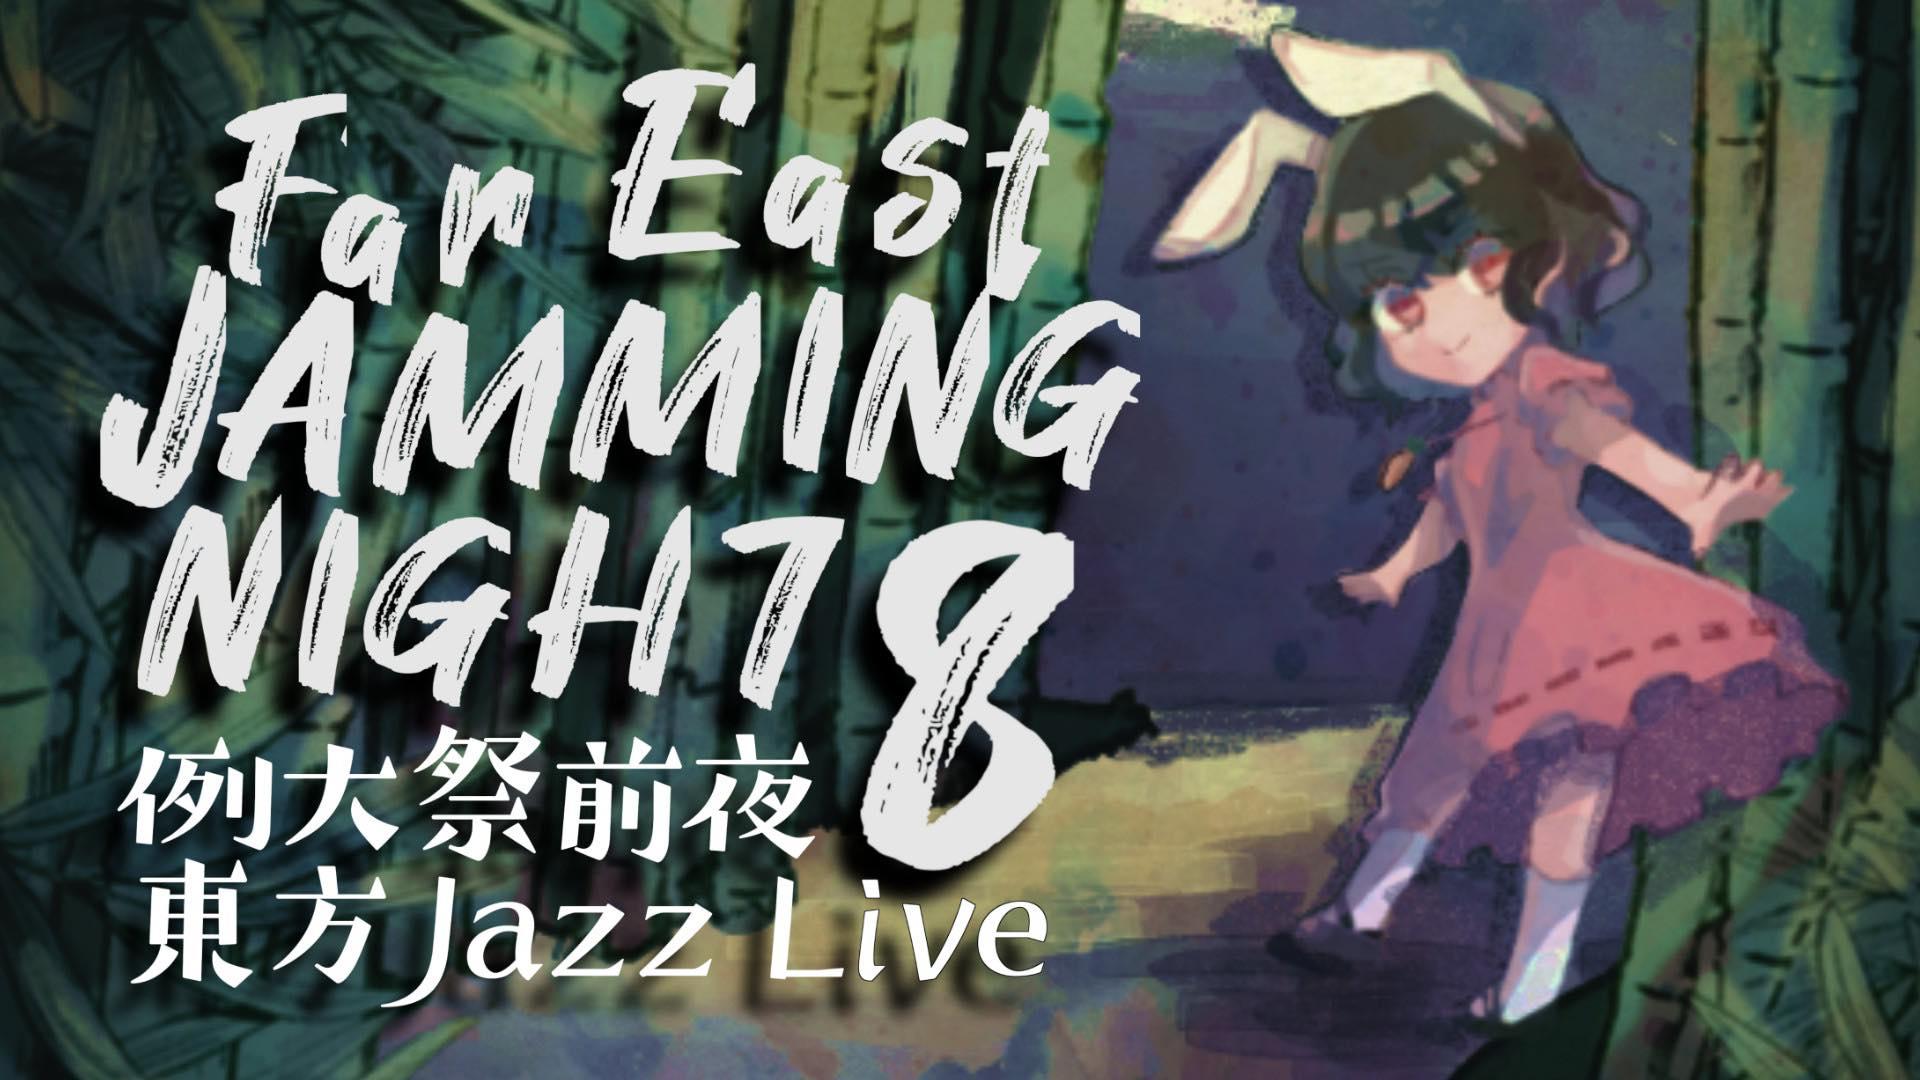 Far East JAMMING NIGHT 8 例大祭前夜 東方Jazz Live